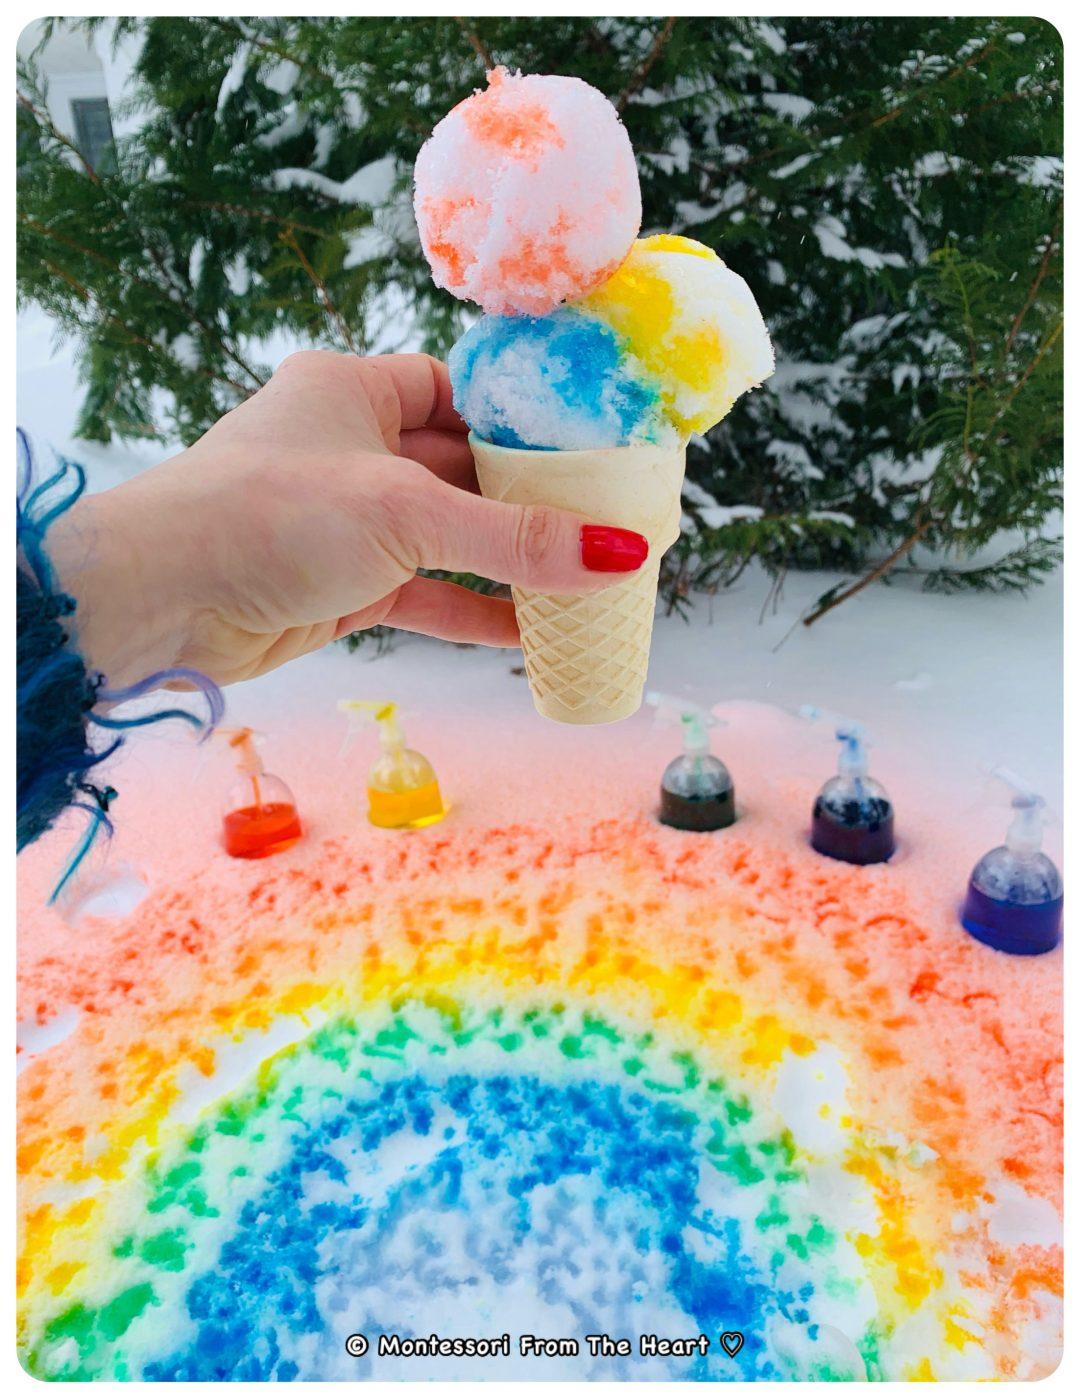 *Snow-Cone-Icecream-Making-Winter-Outdoors